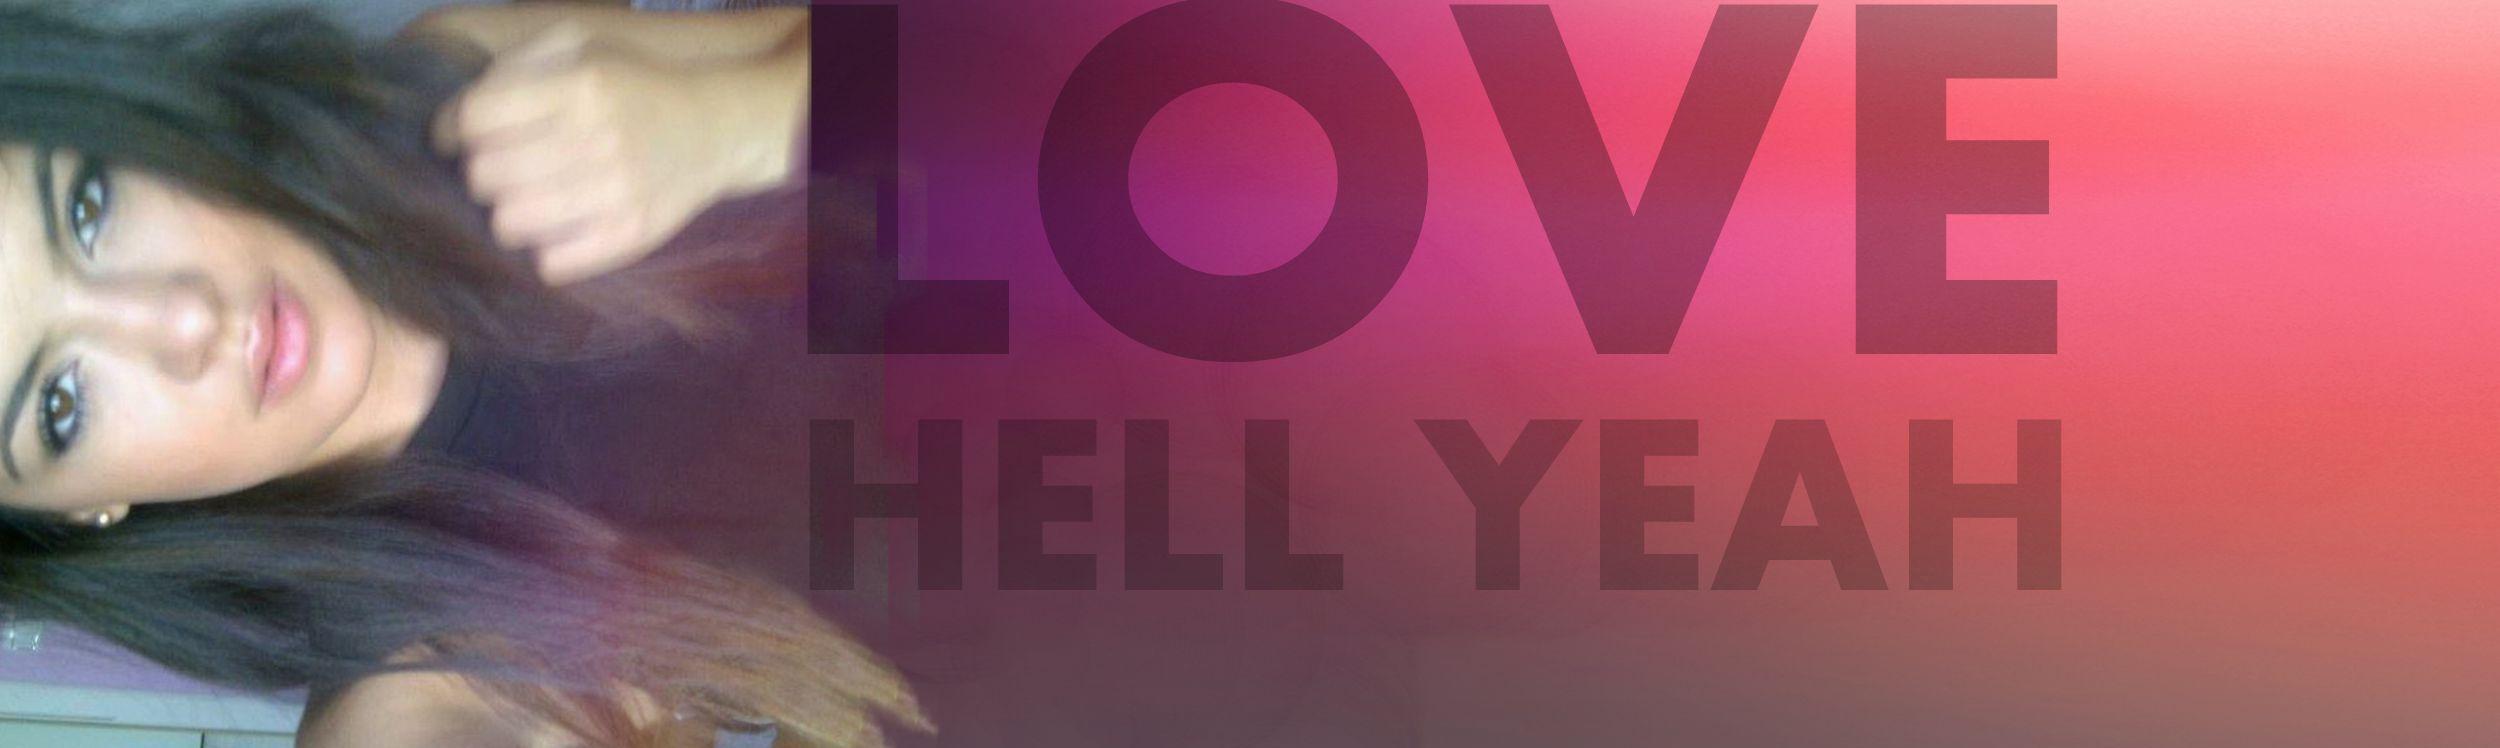 lovehellyeah